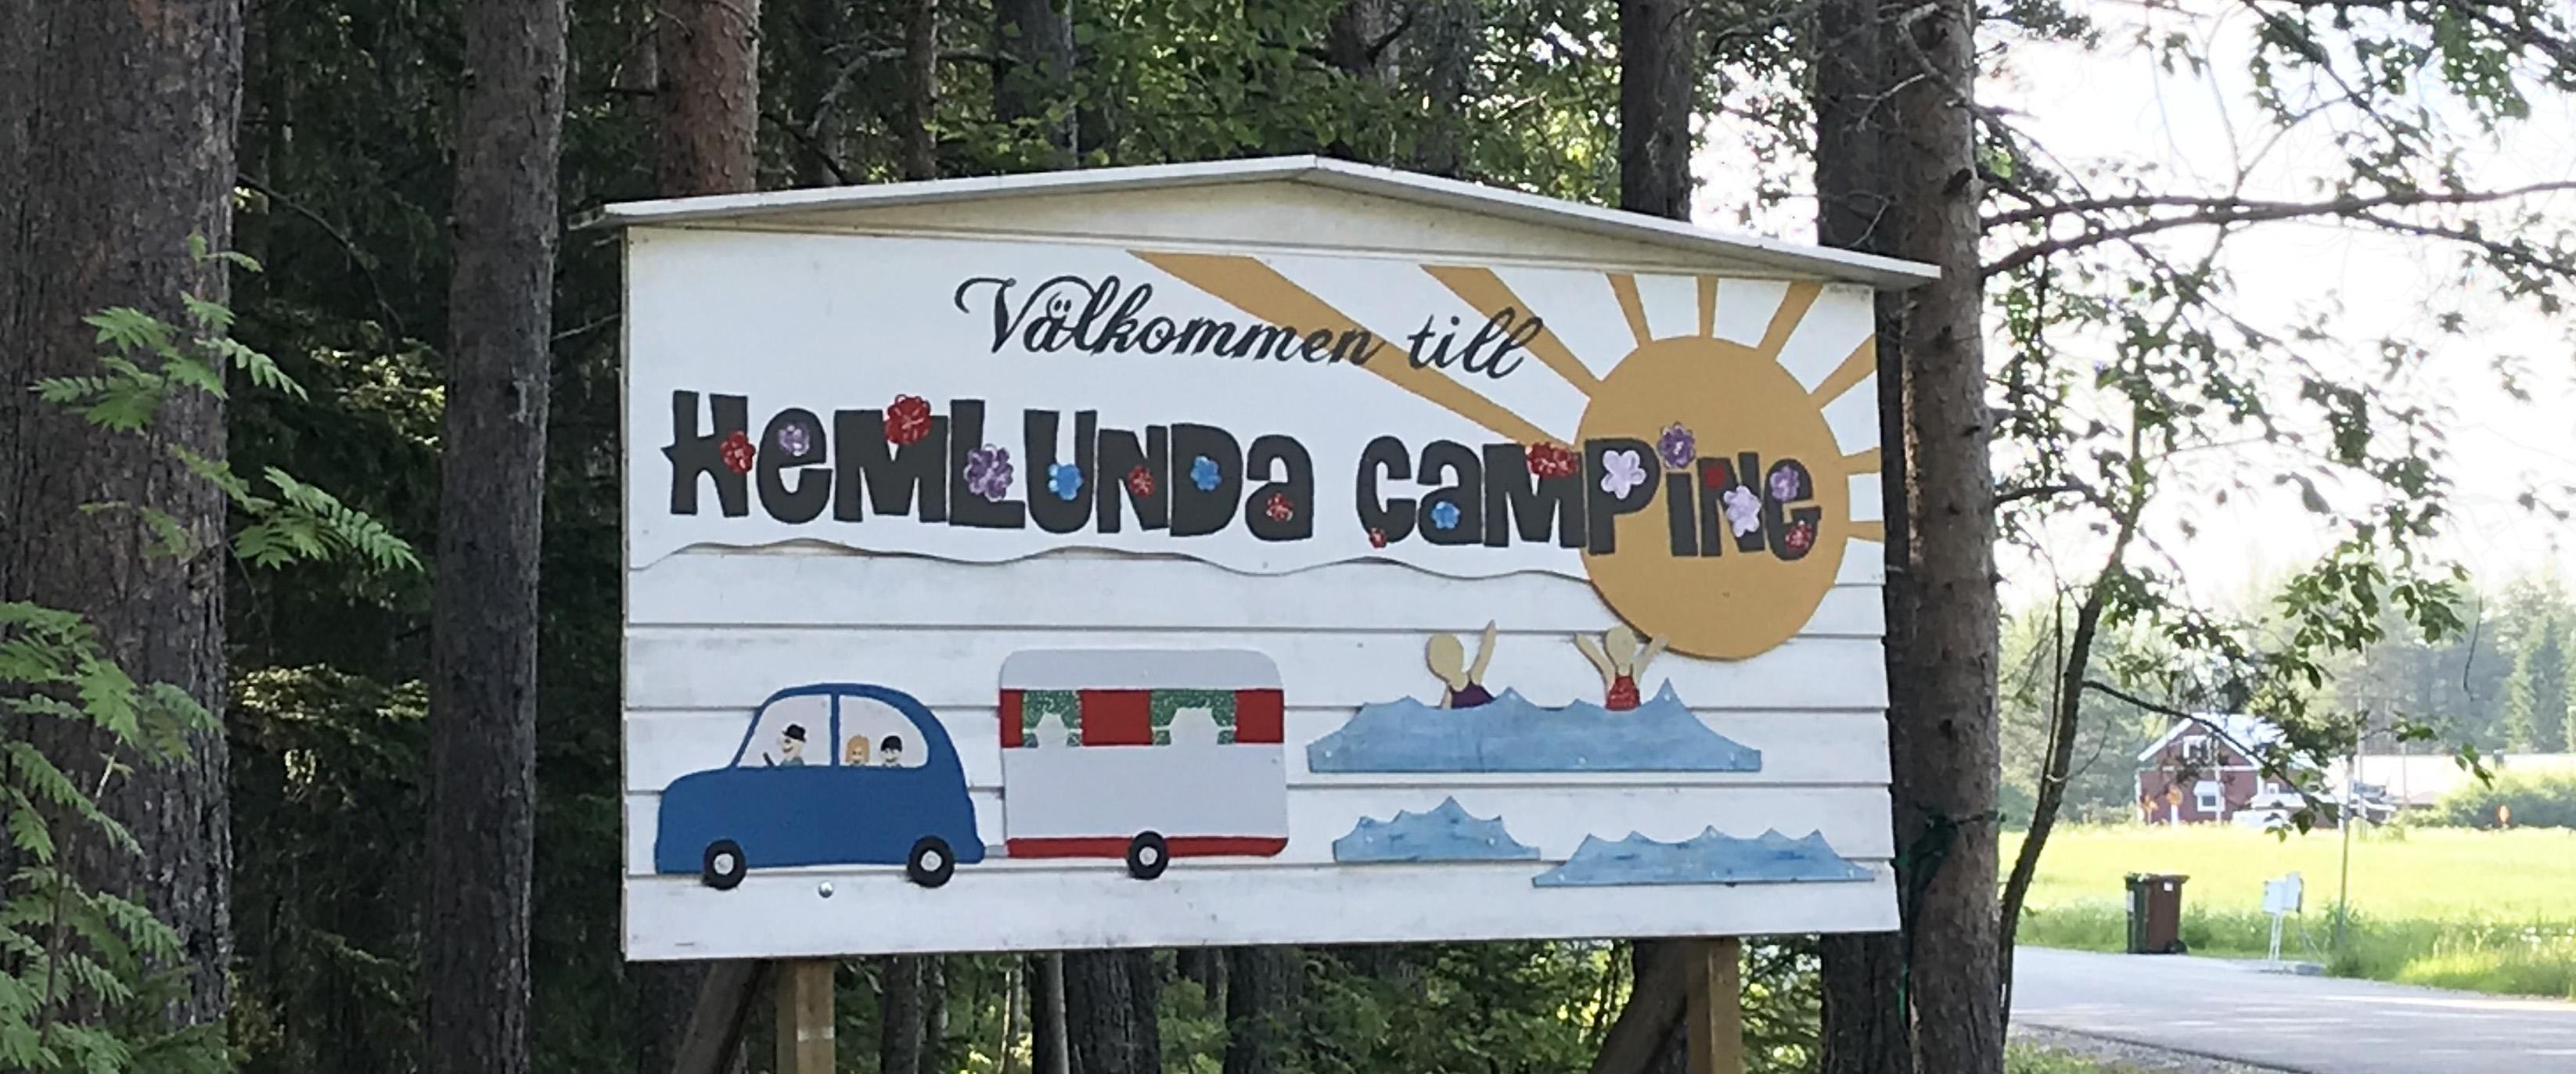 Hemlunda Camping